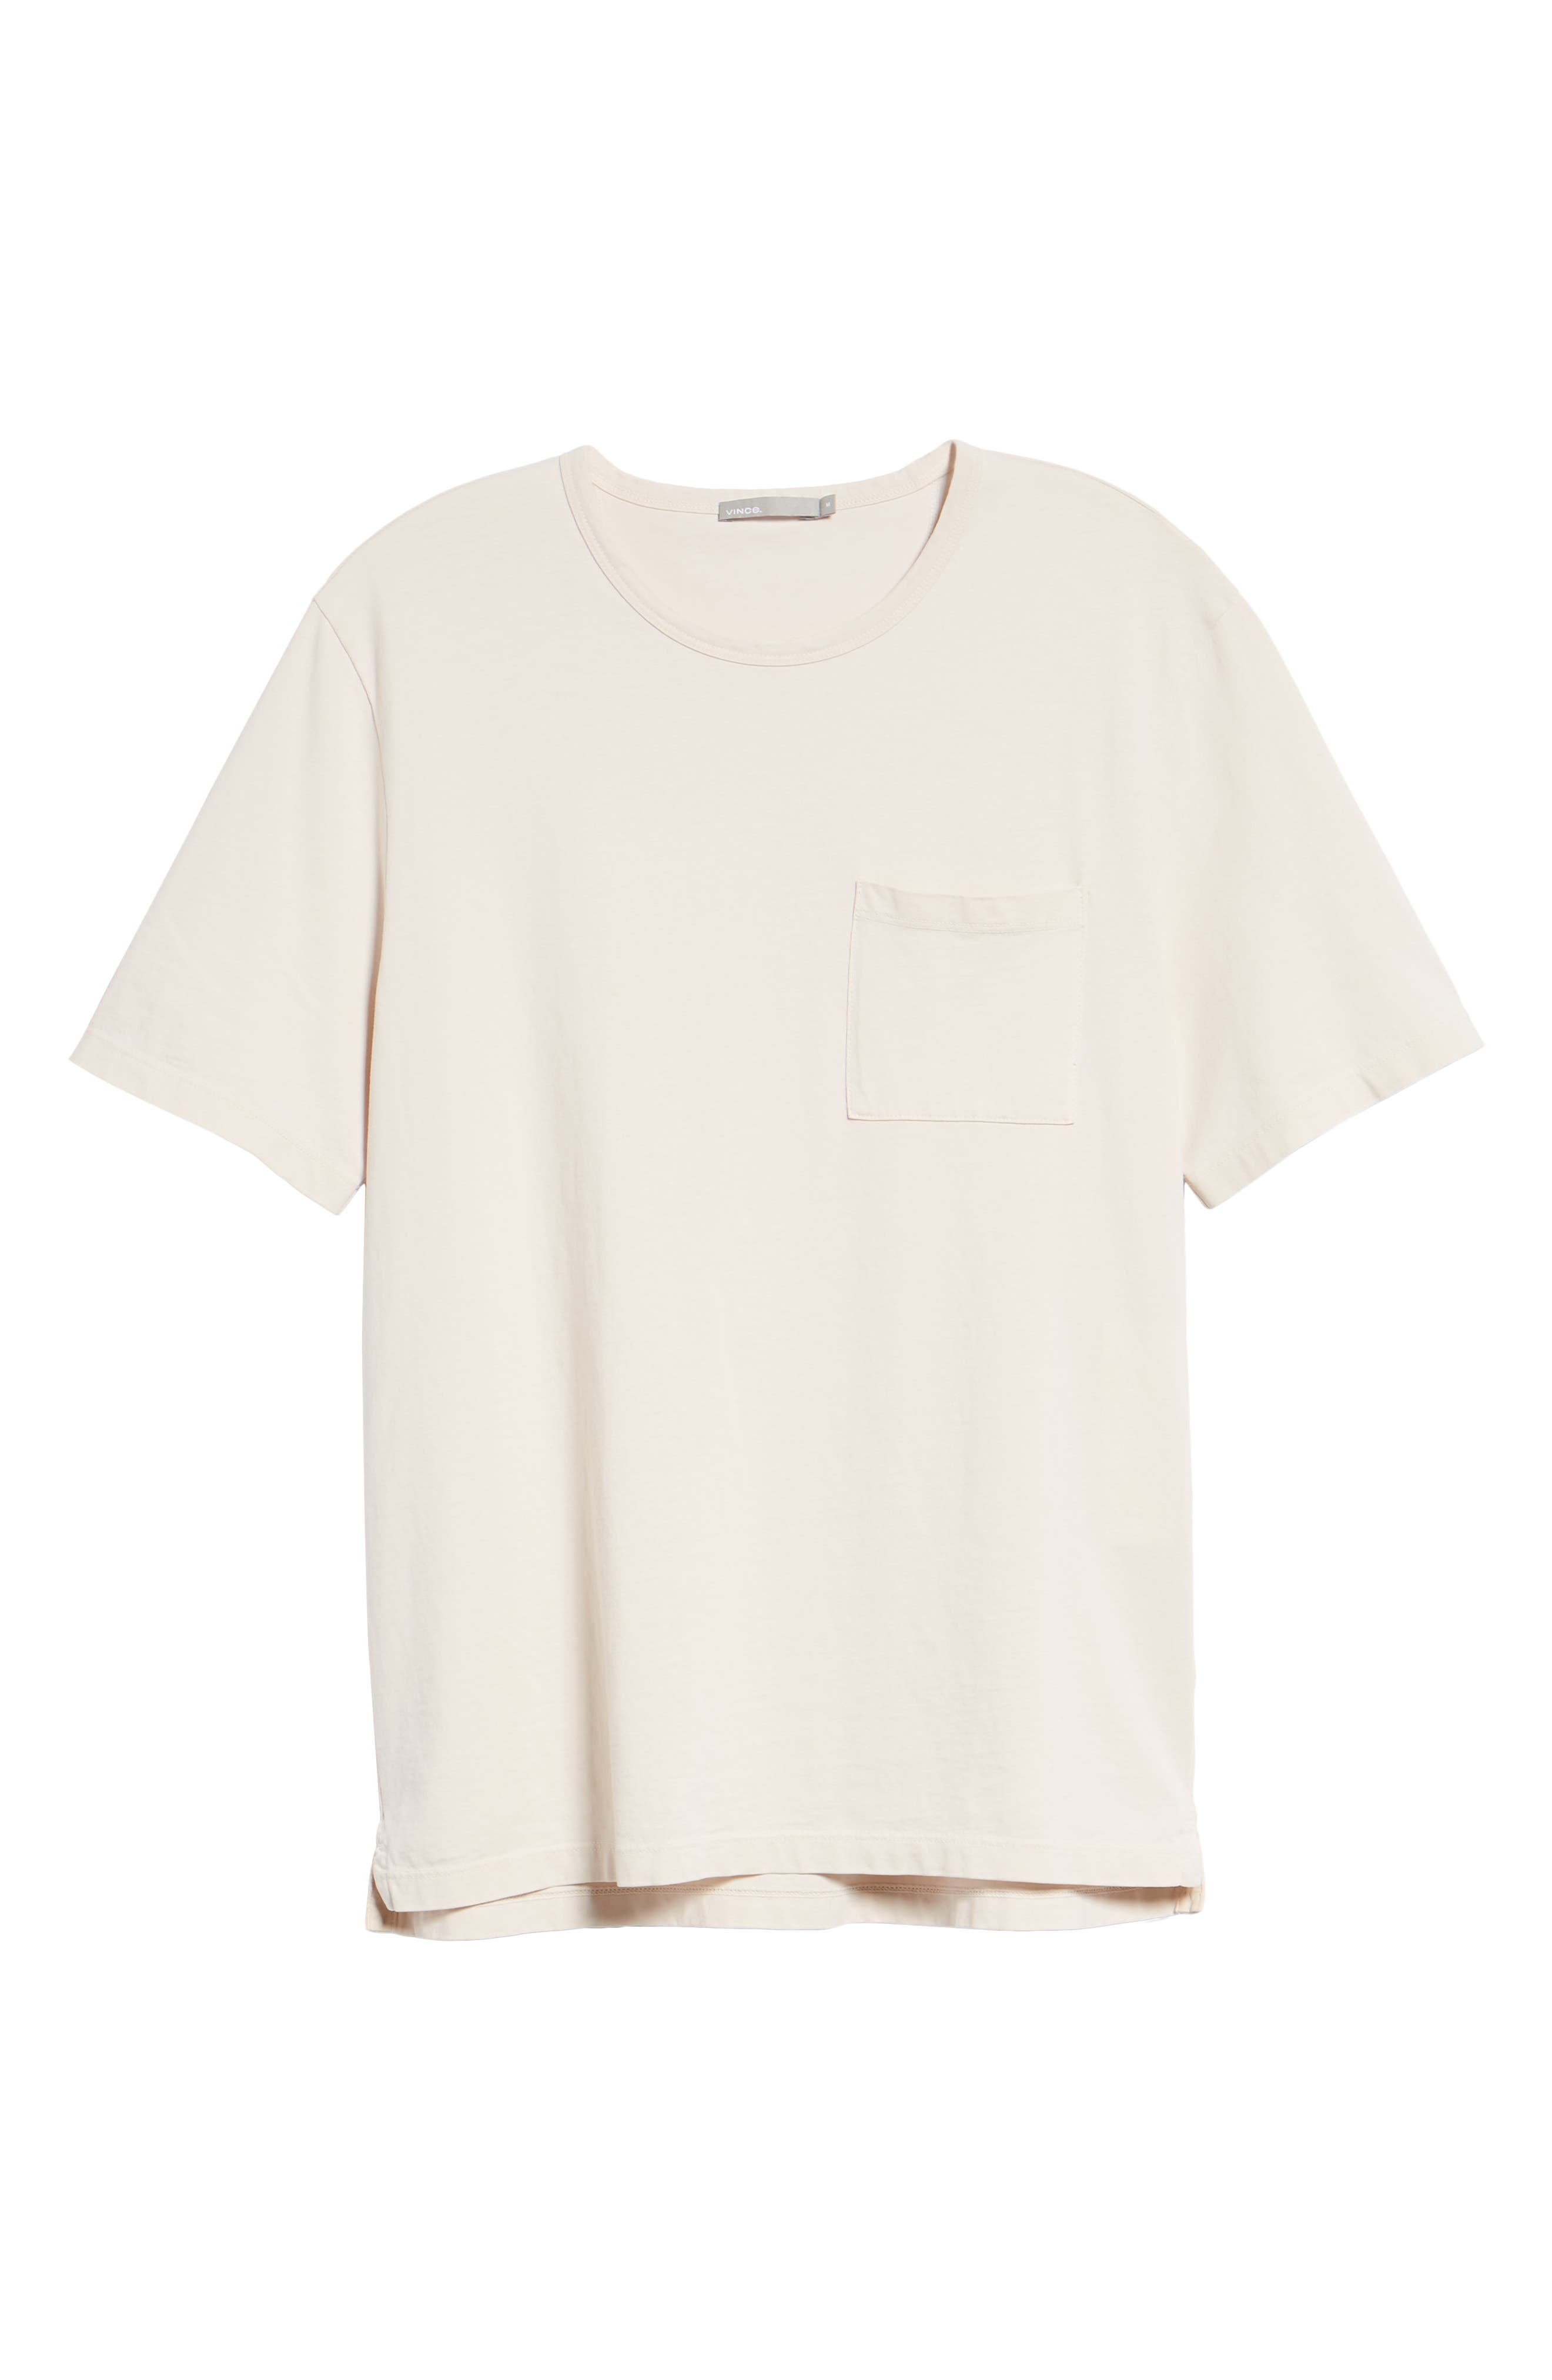 Regular Fit Garment Dye Pocket T-Shirt,                             Alternate thumbnail 6, color,                             SAIL